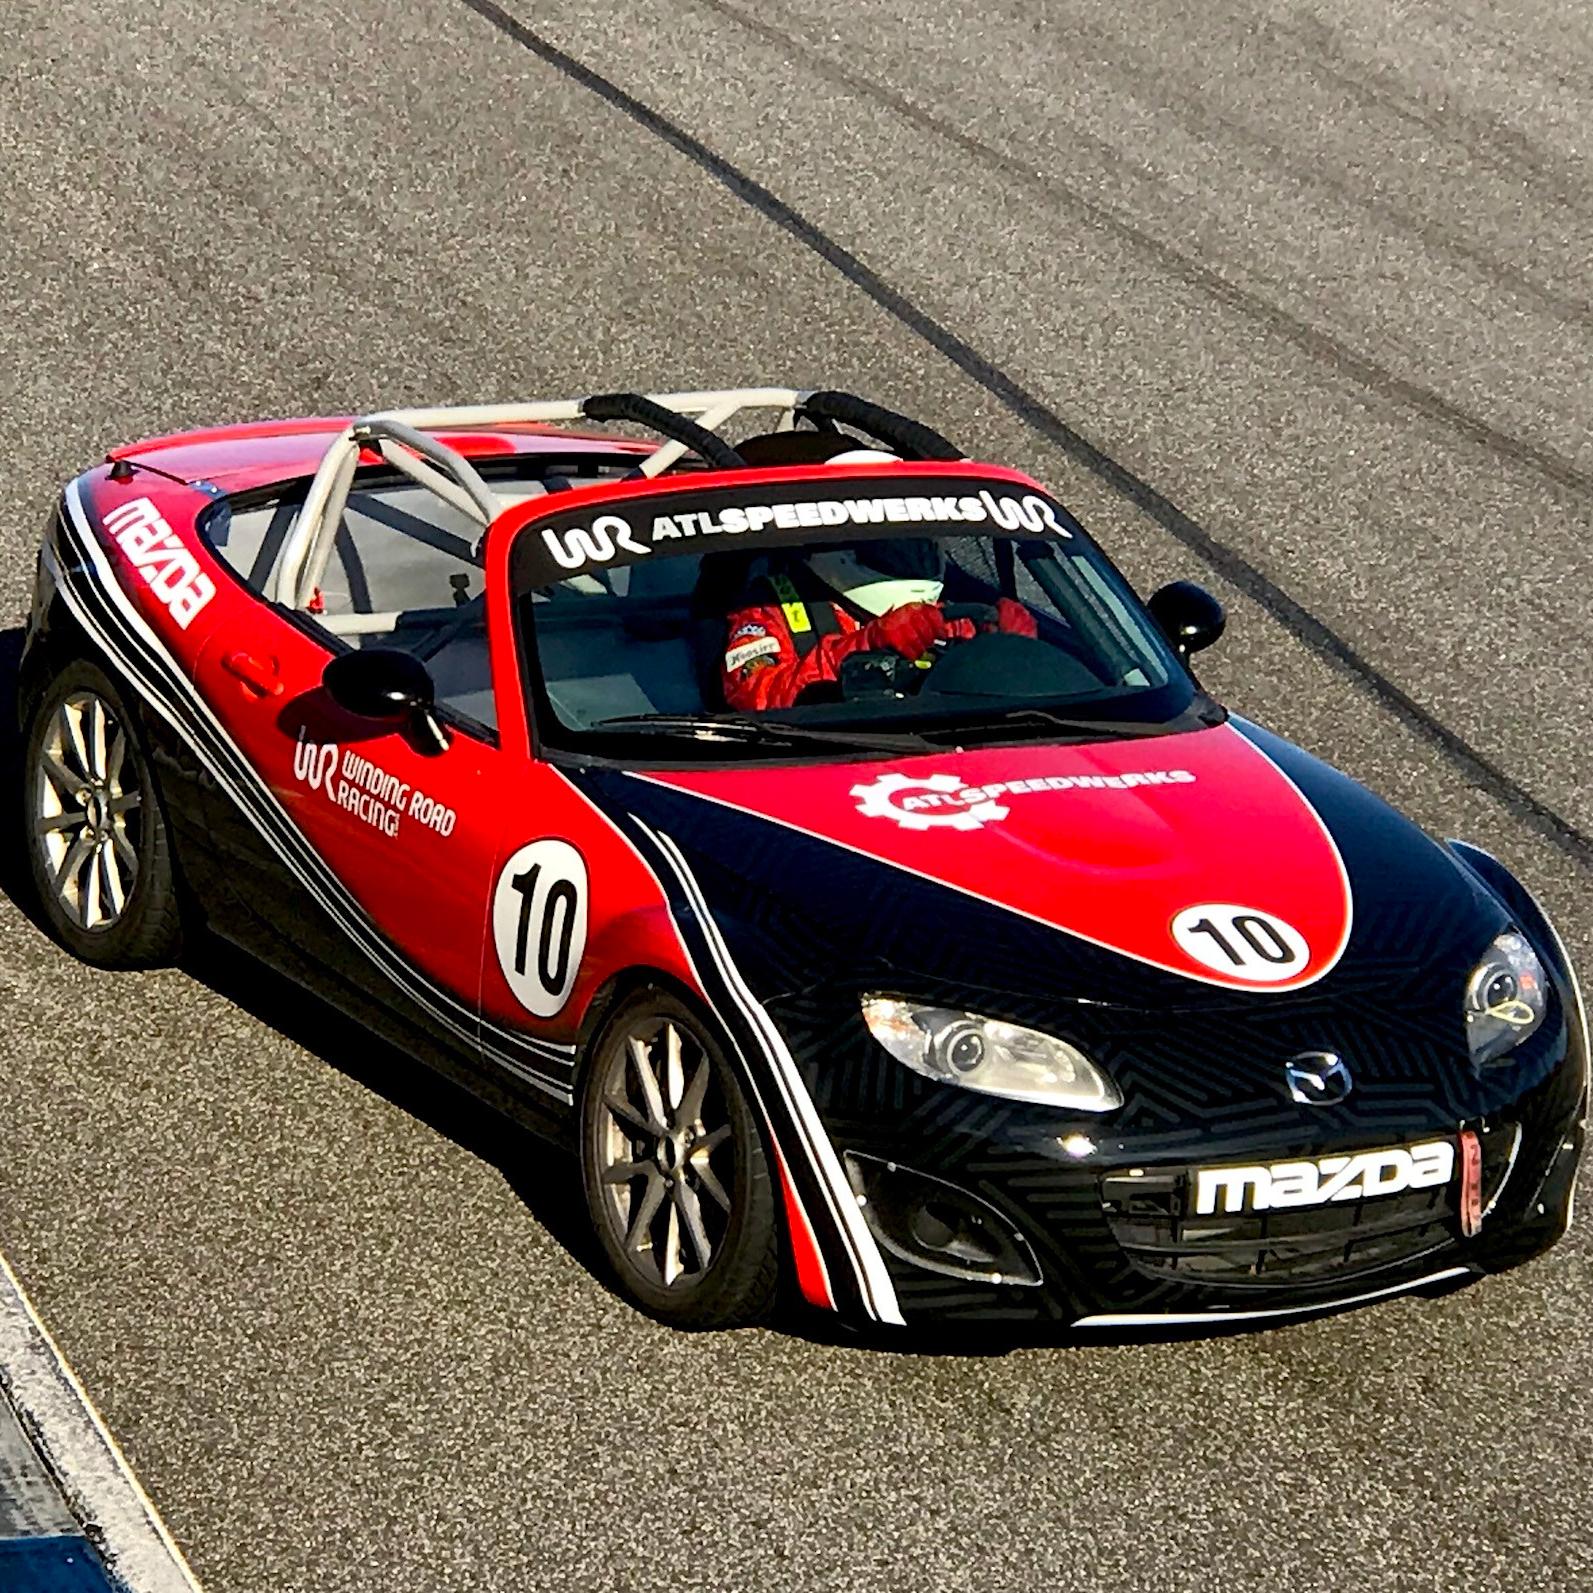 Spec MX-5 Race Cars